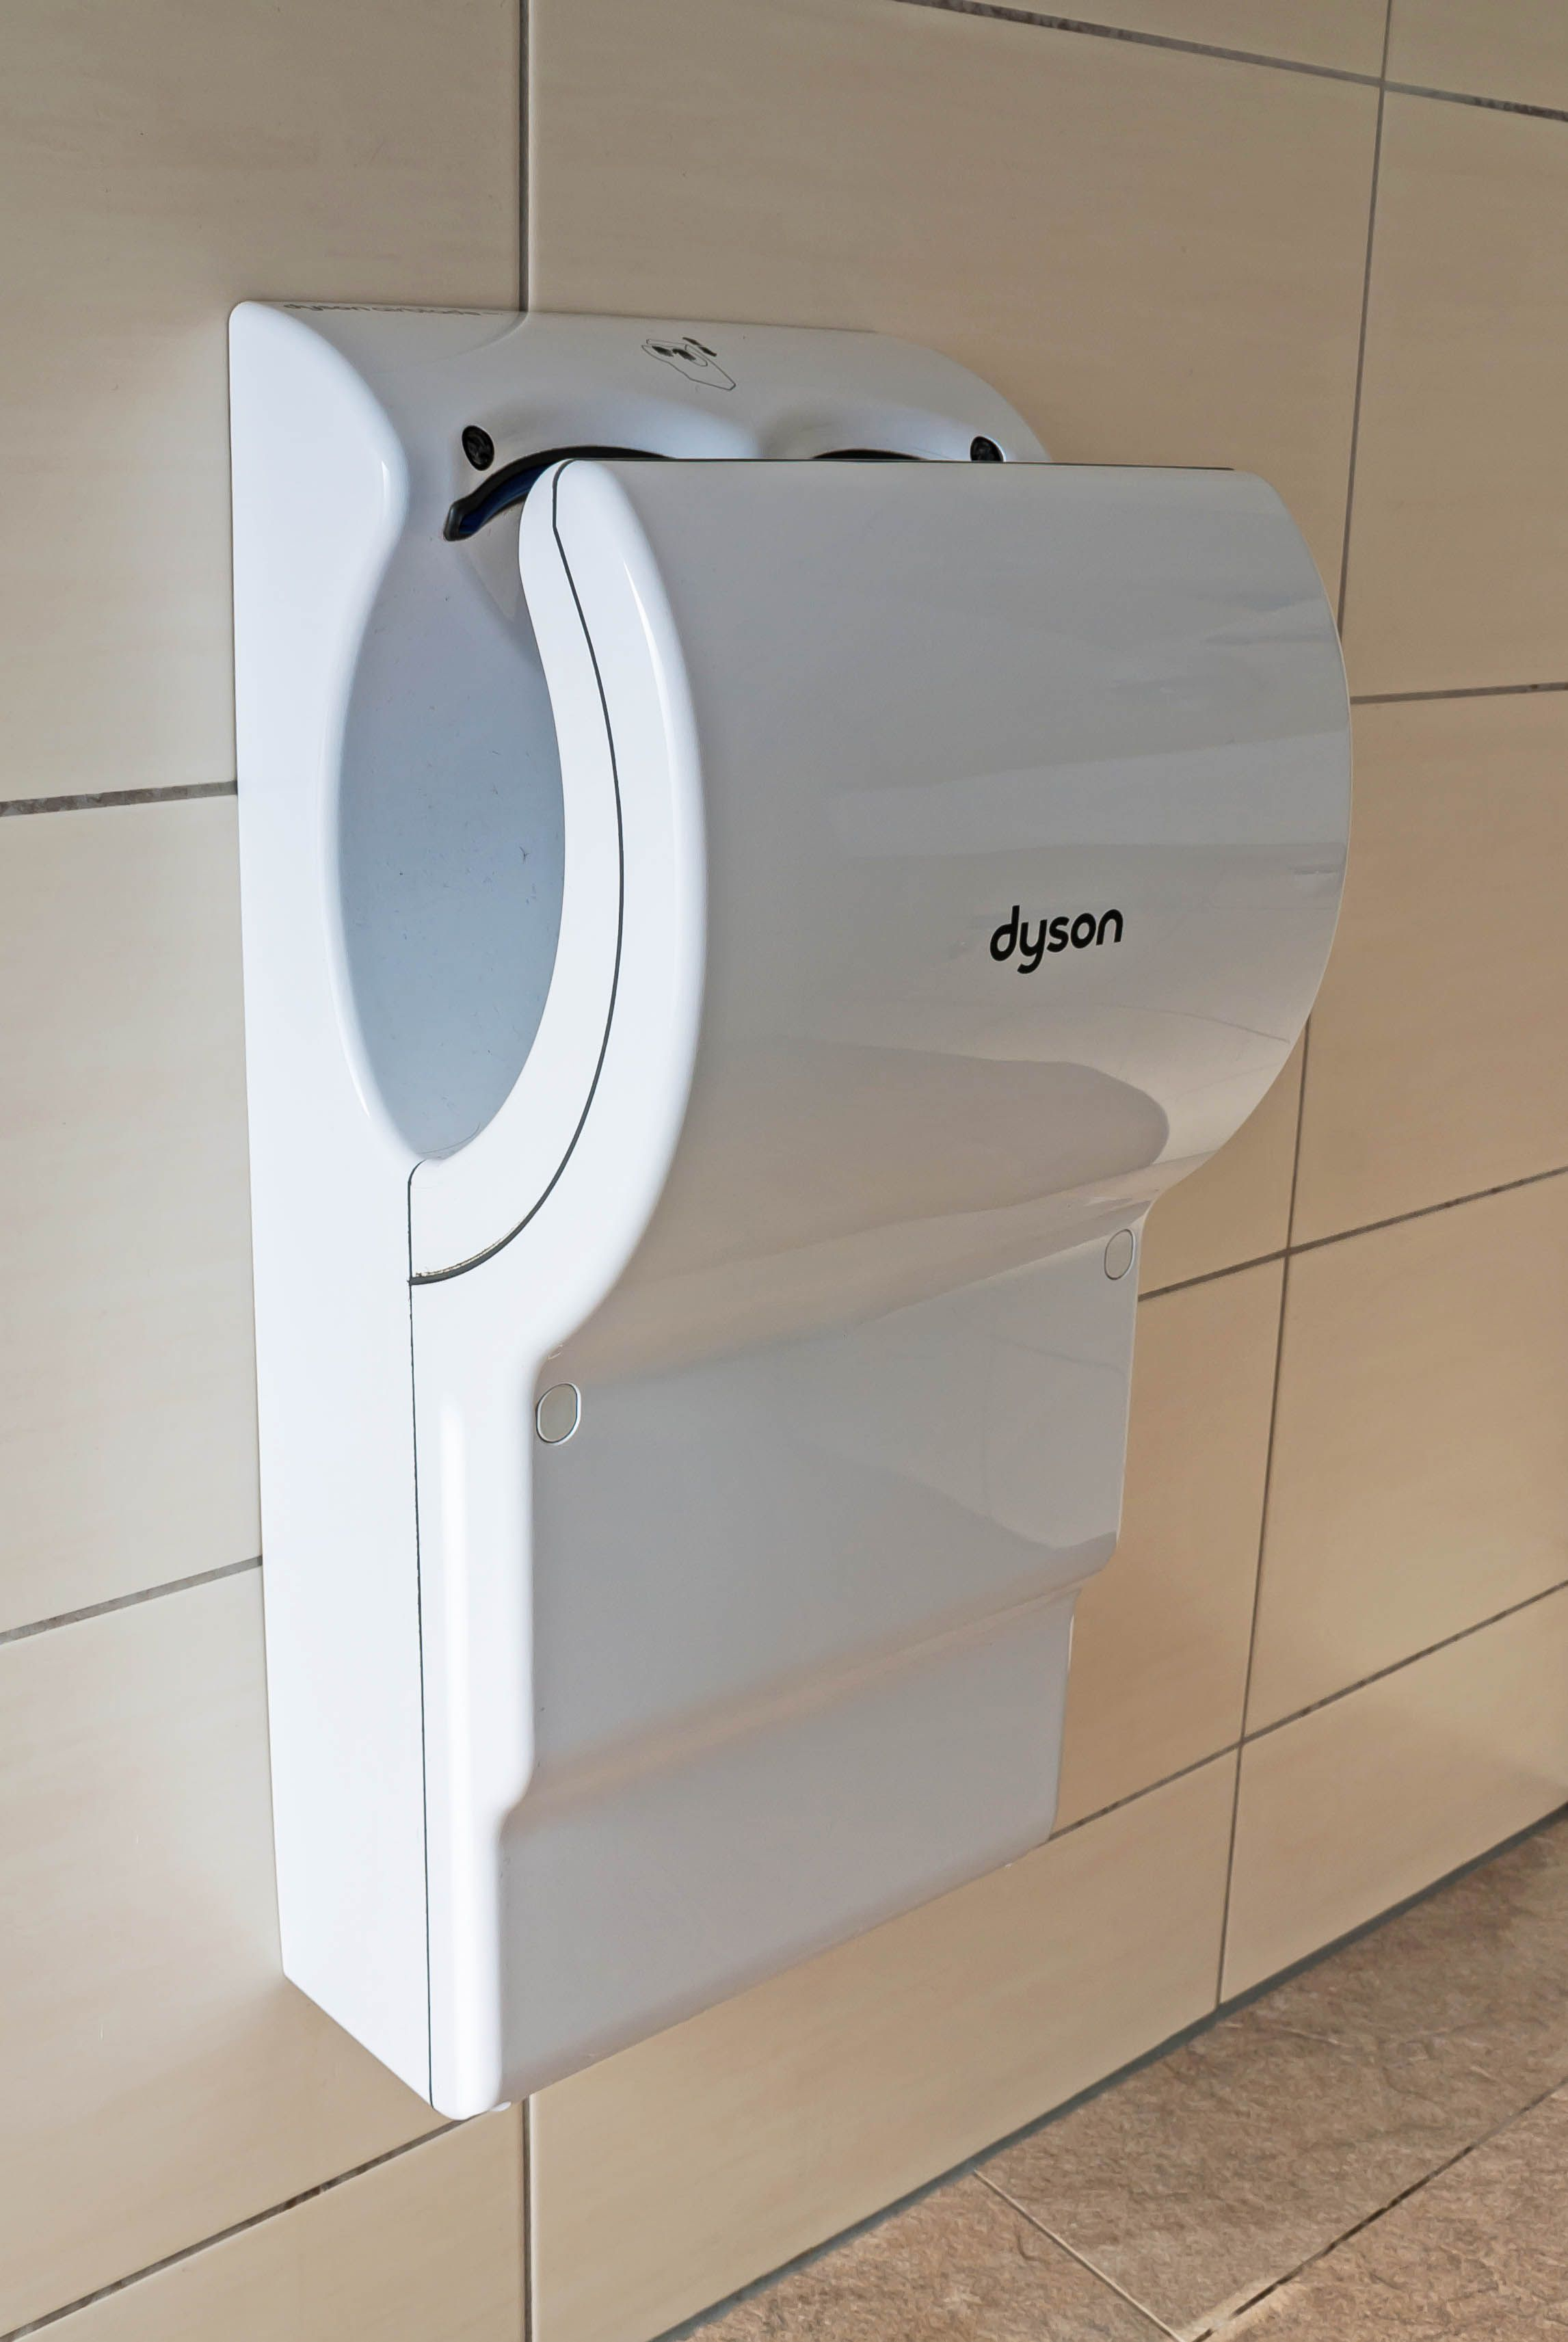 Сушка для рук dyson airblade db пылесос dyson dc41 allergy